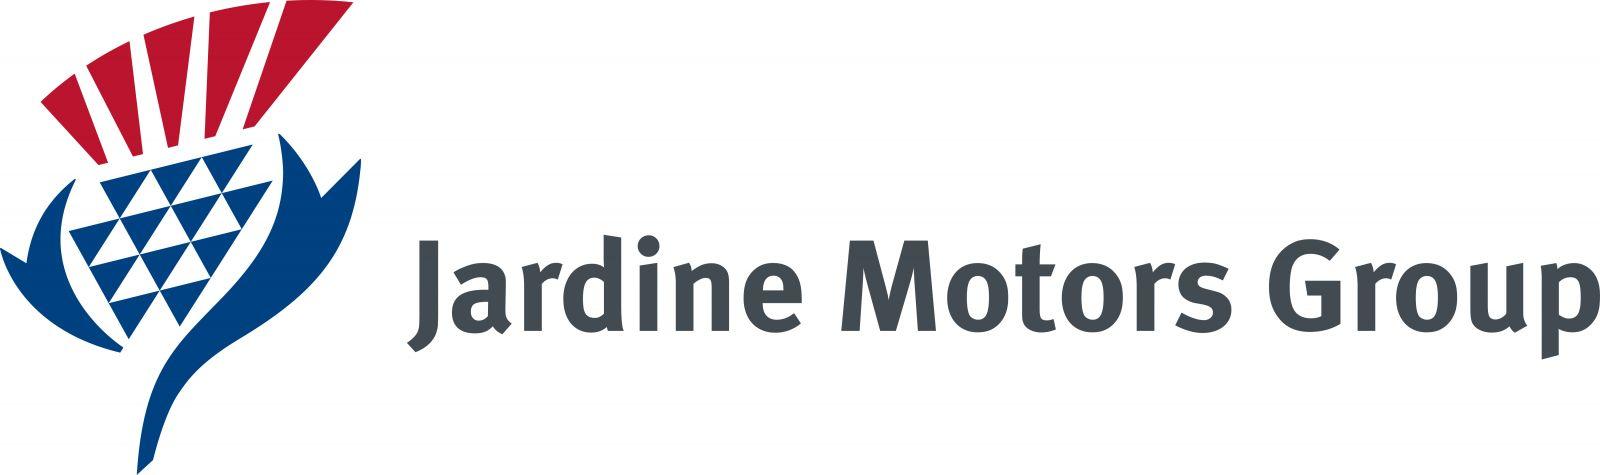 Jardine Motors Group logo